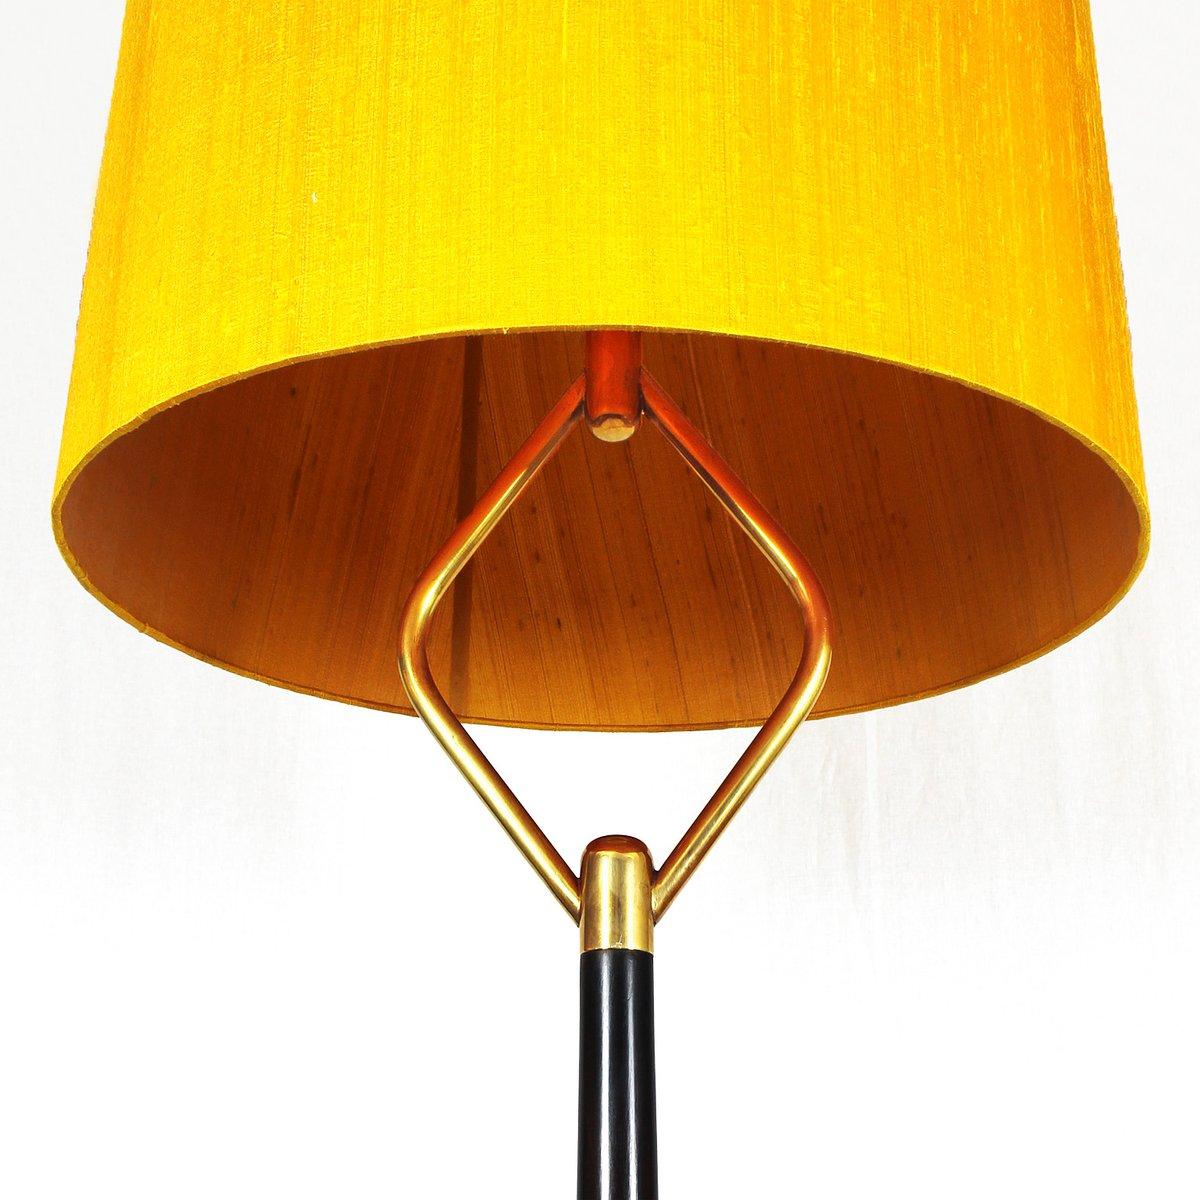 Italian mahogany floor lamp 1940s for sale at pamono italian mahogany floor lamp 1940s 8 457500 price per piece geotapseo Choice Image